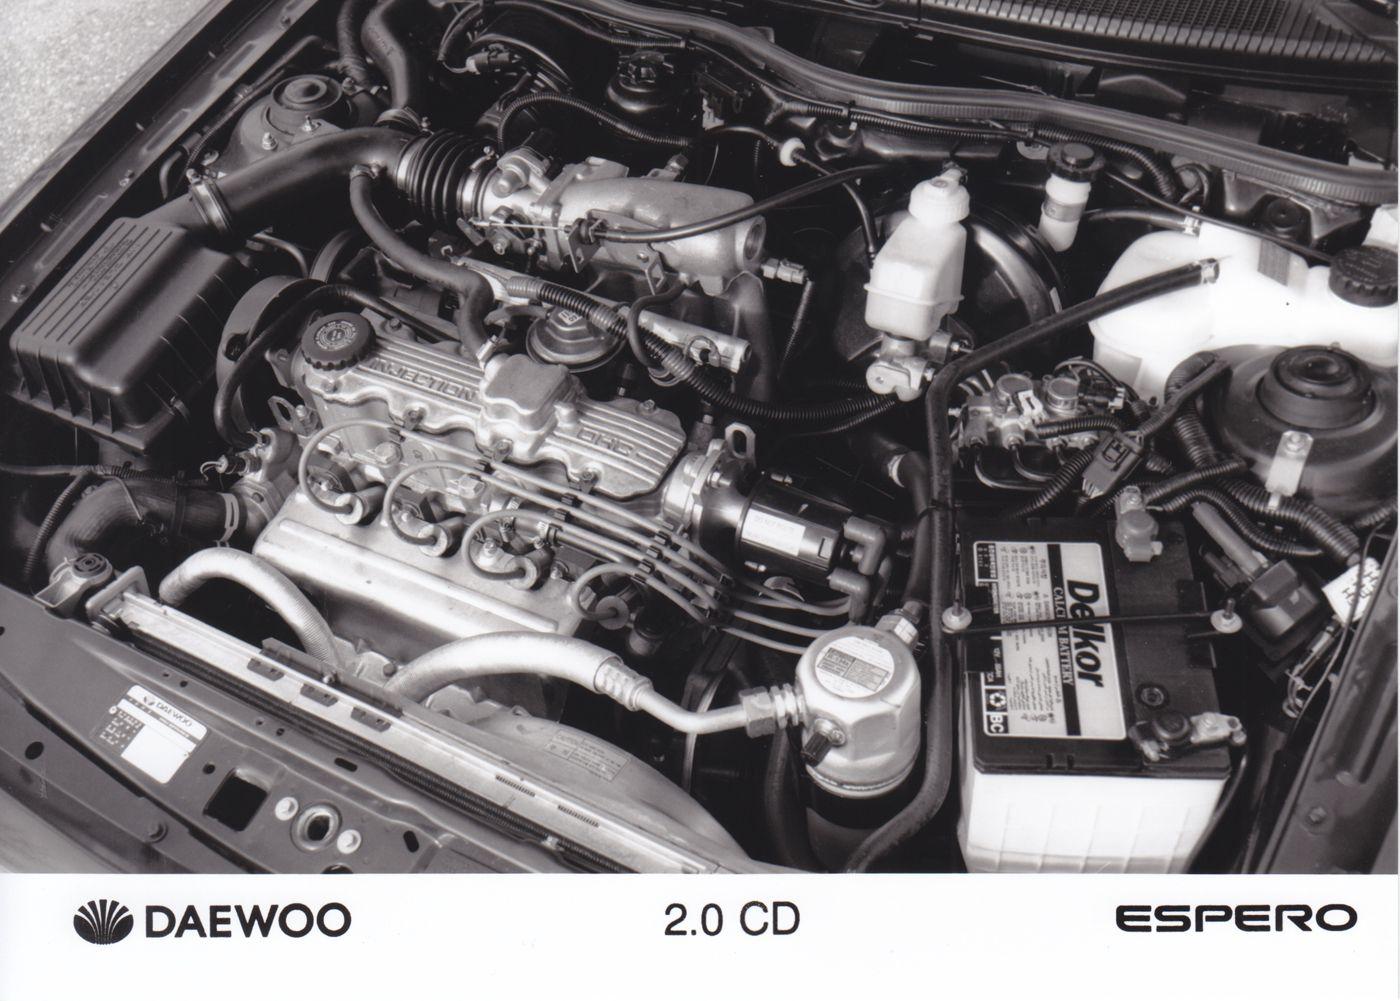 Daewoo Espero 2.0 CD engine Car factory press photos